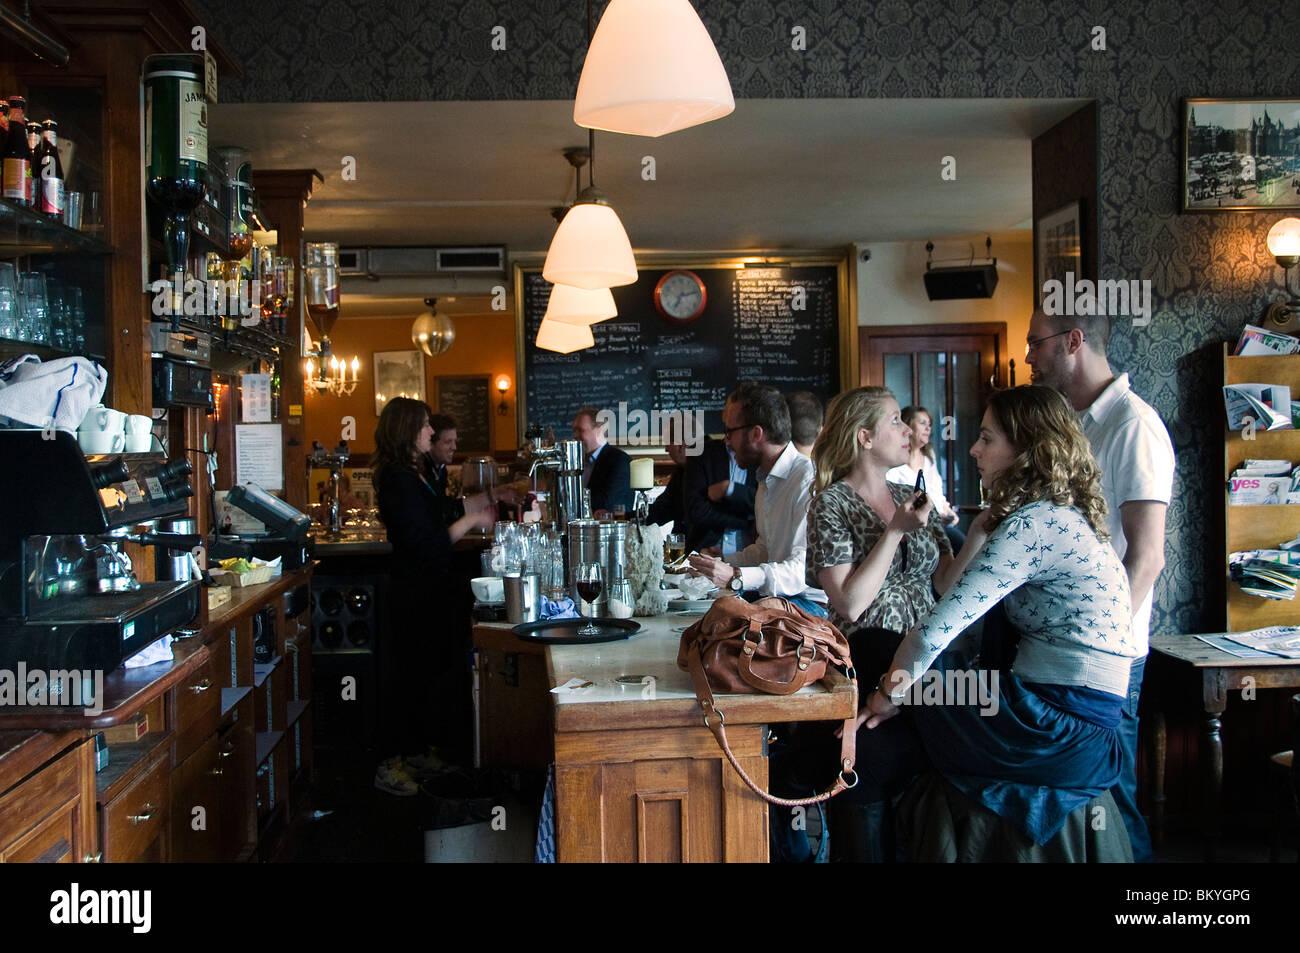 Nieuwmarkt amsterdam cafe stevens bar pub netherlands red light nieuwmarkt amsterdam cafe stevens bar pub netherlands red light district aloadofball Image collections